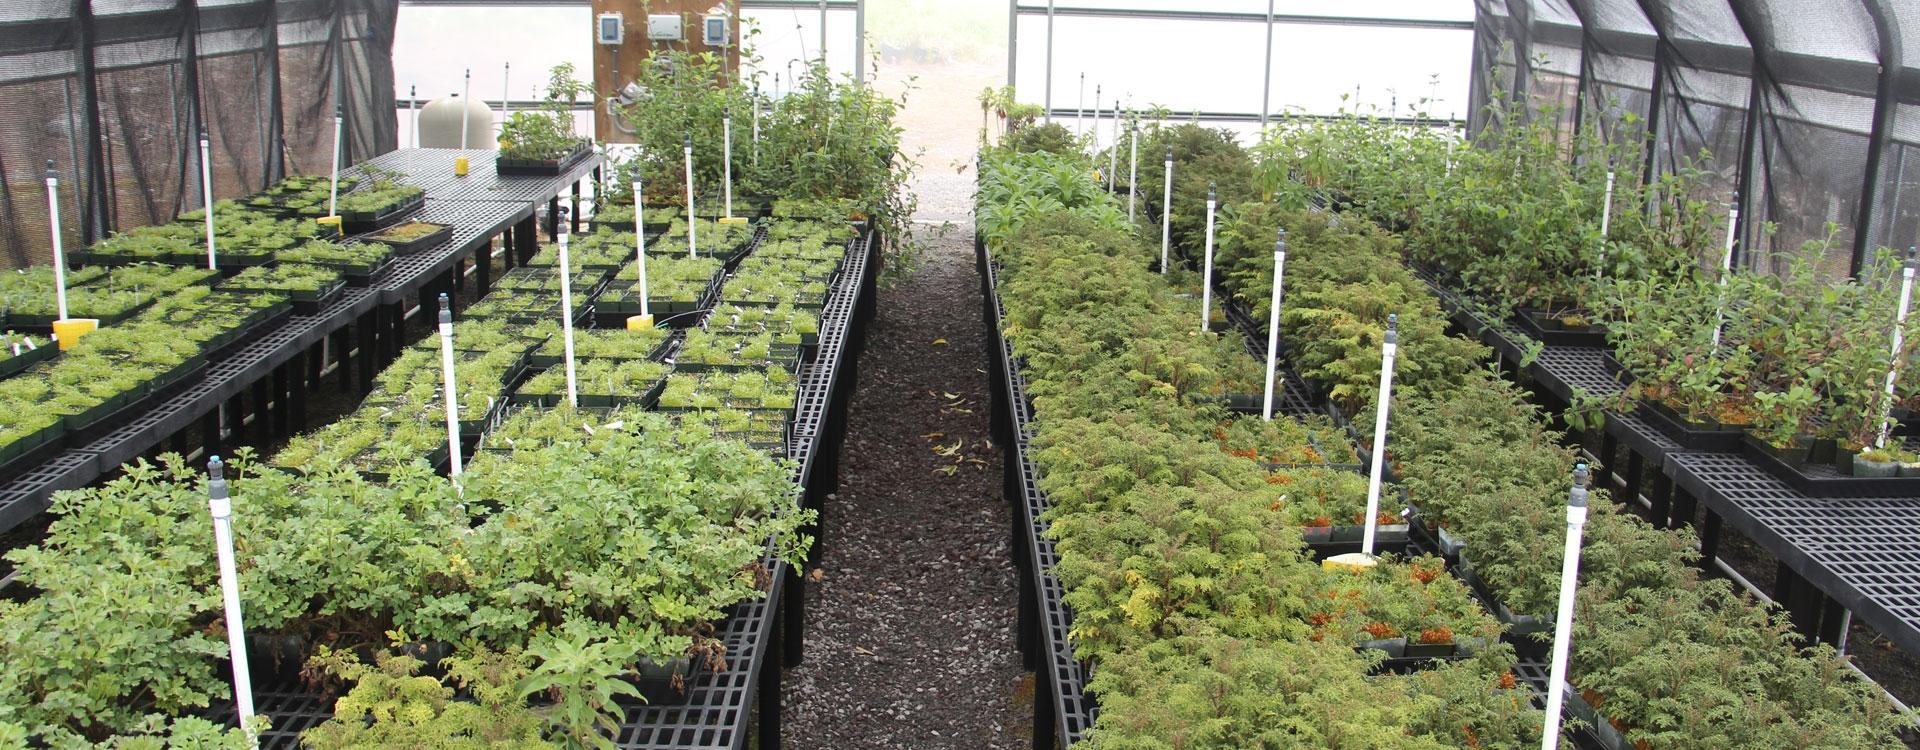 The rare plant nursery